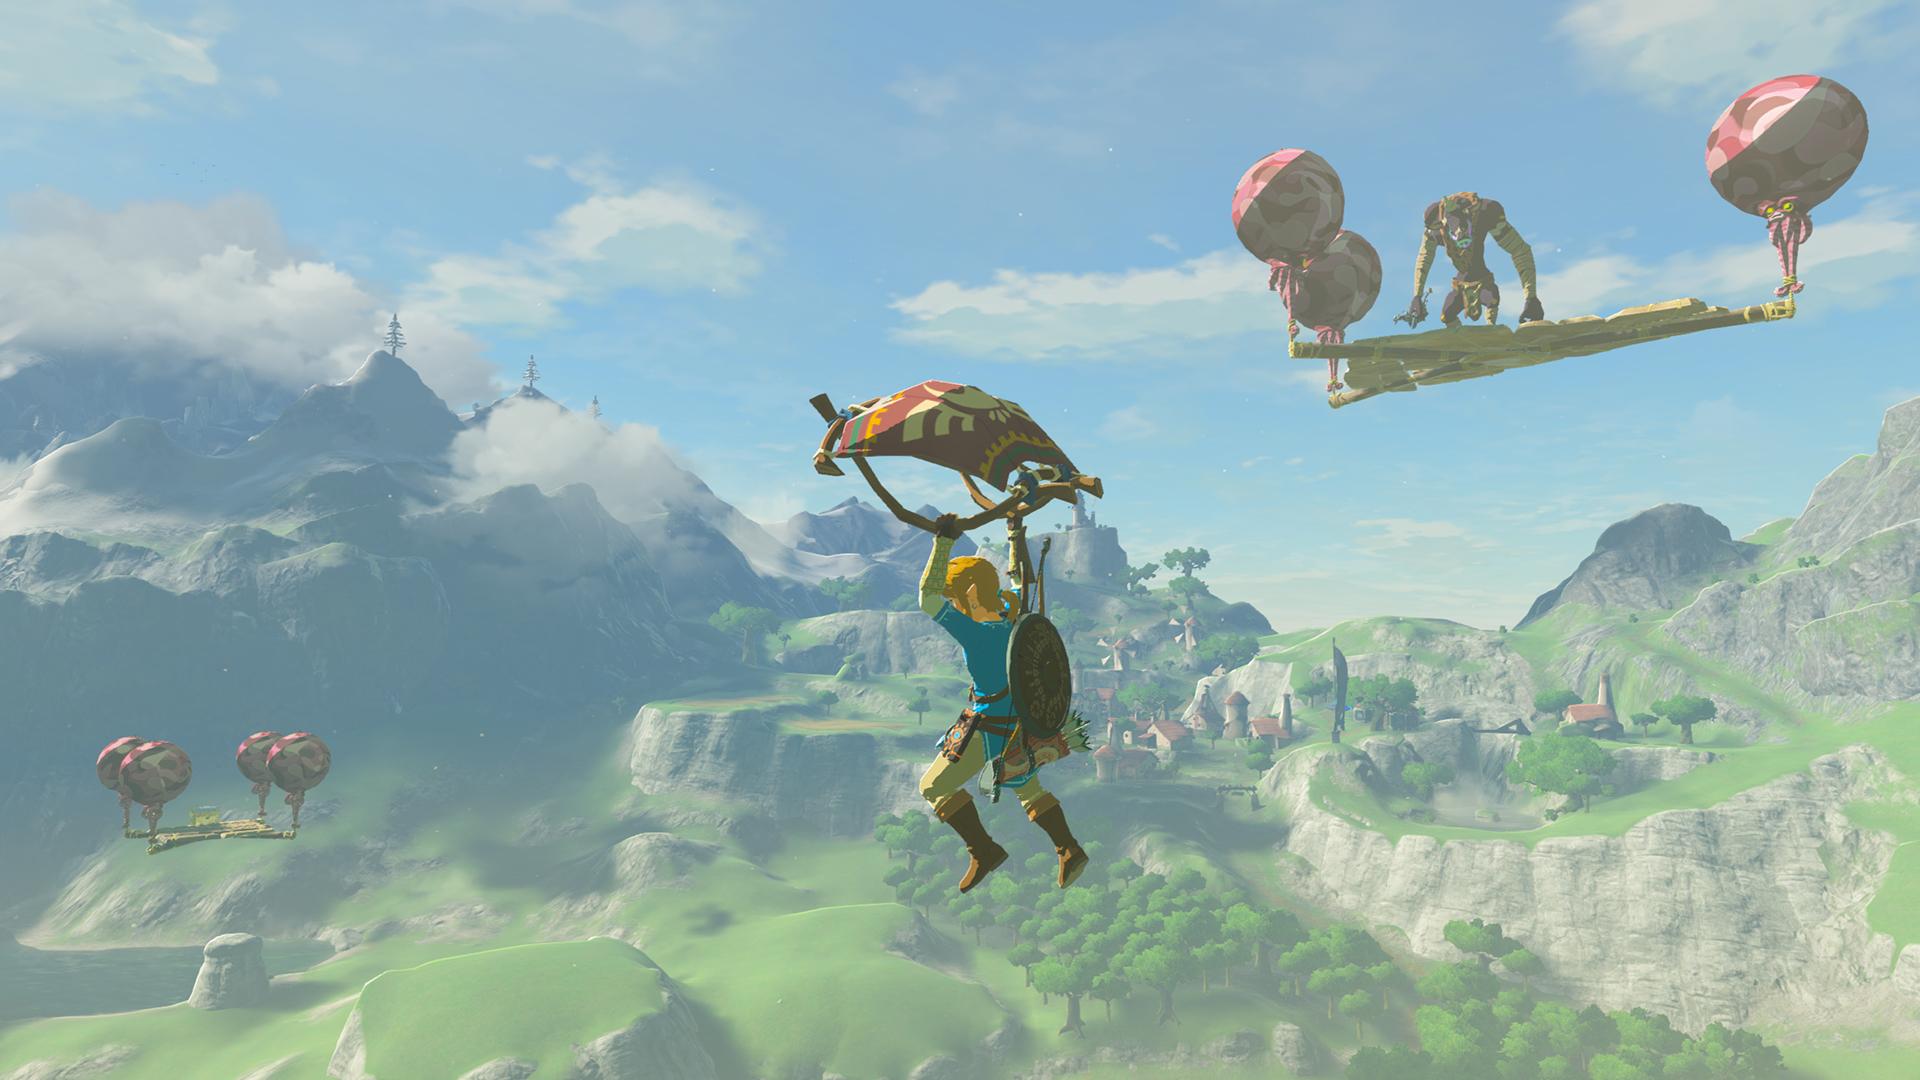 The Legend of Zelda Breath of the Wild Hard Mode Screen 2